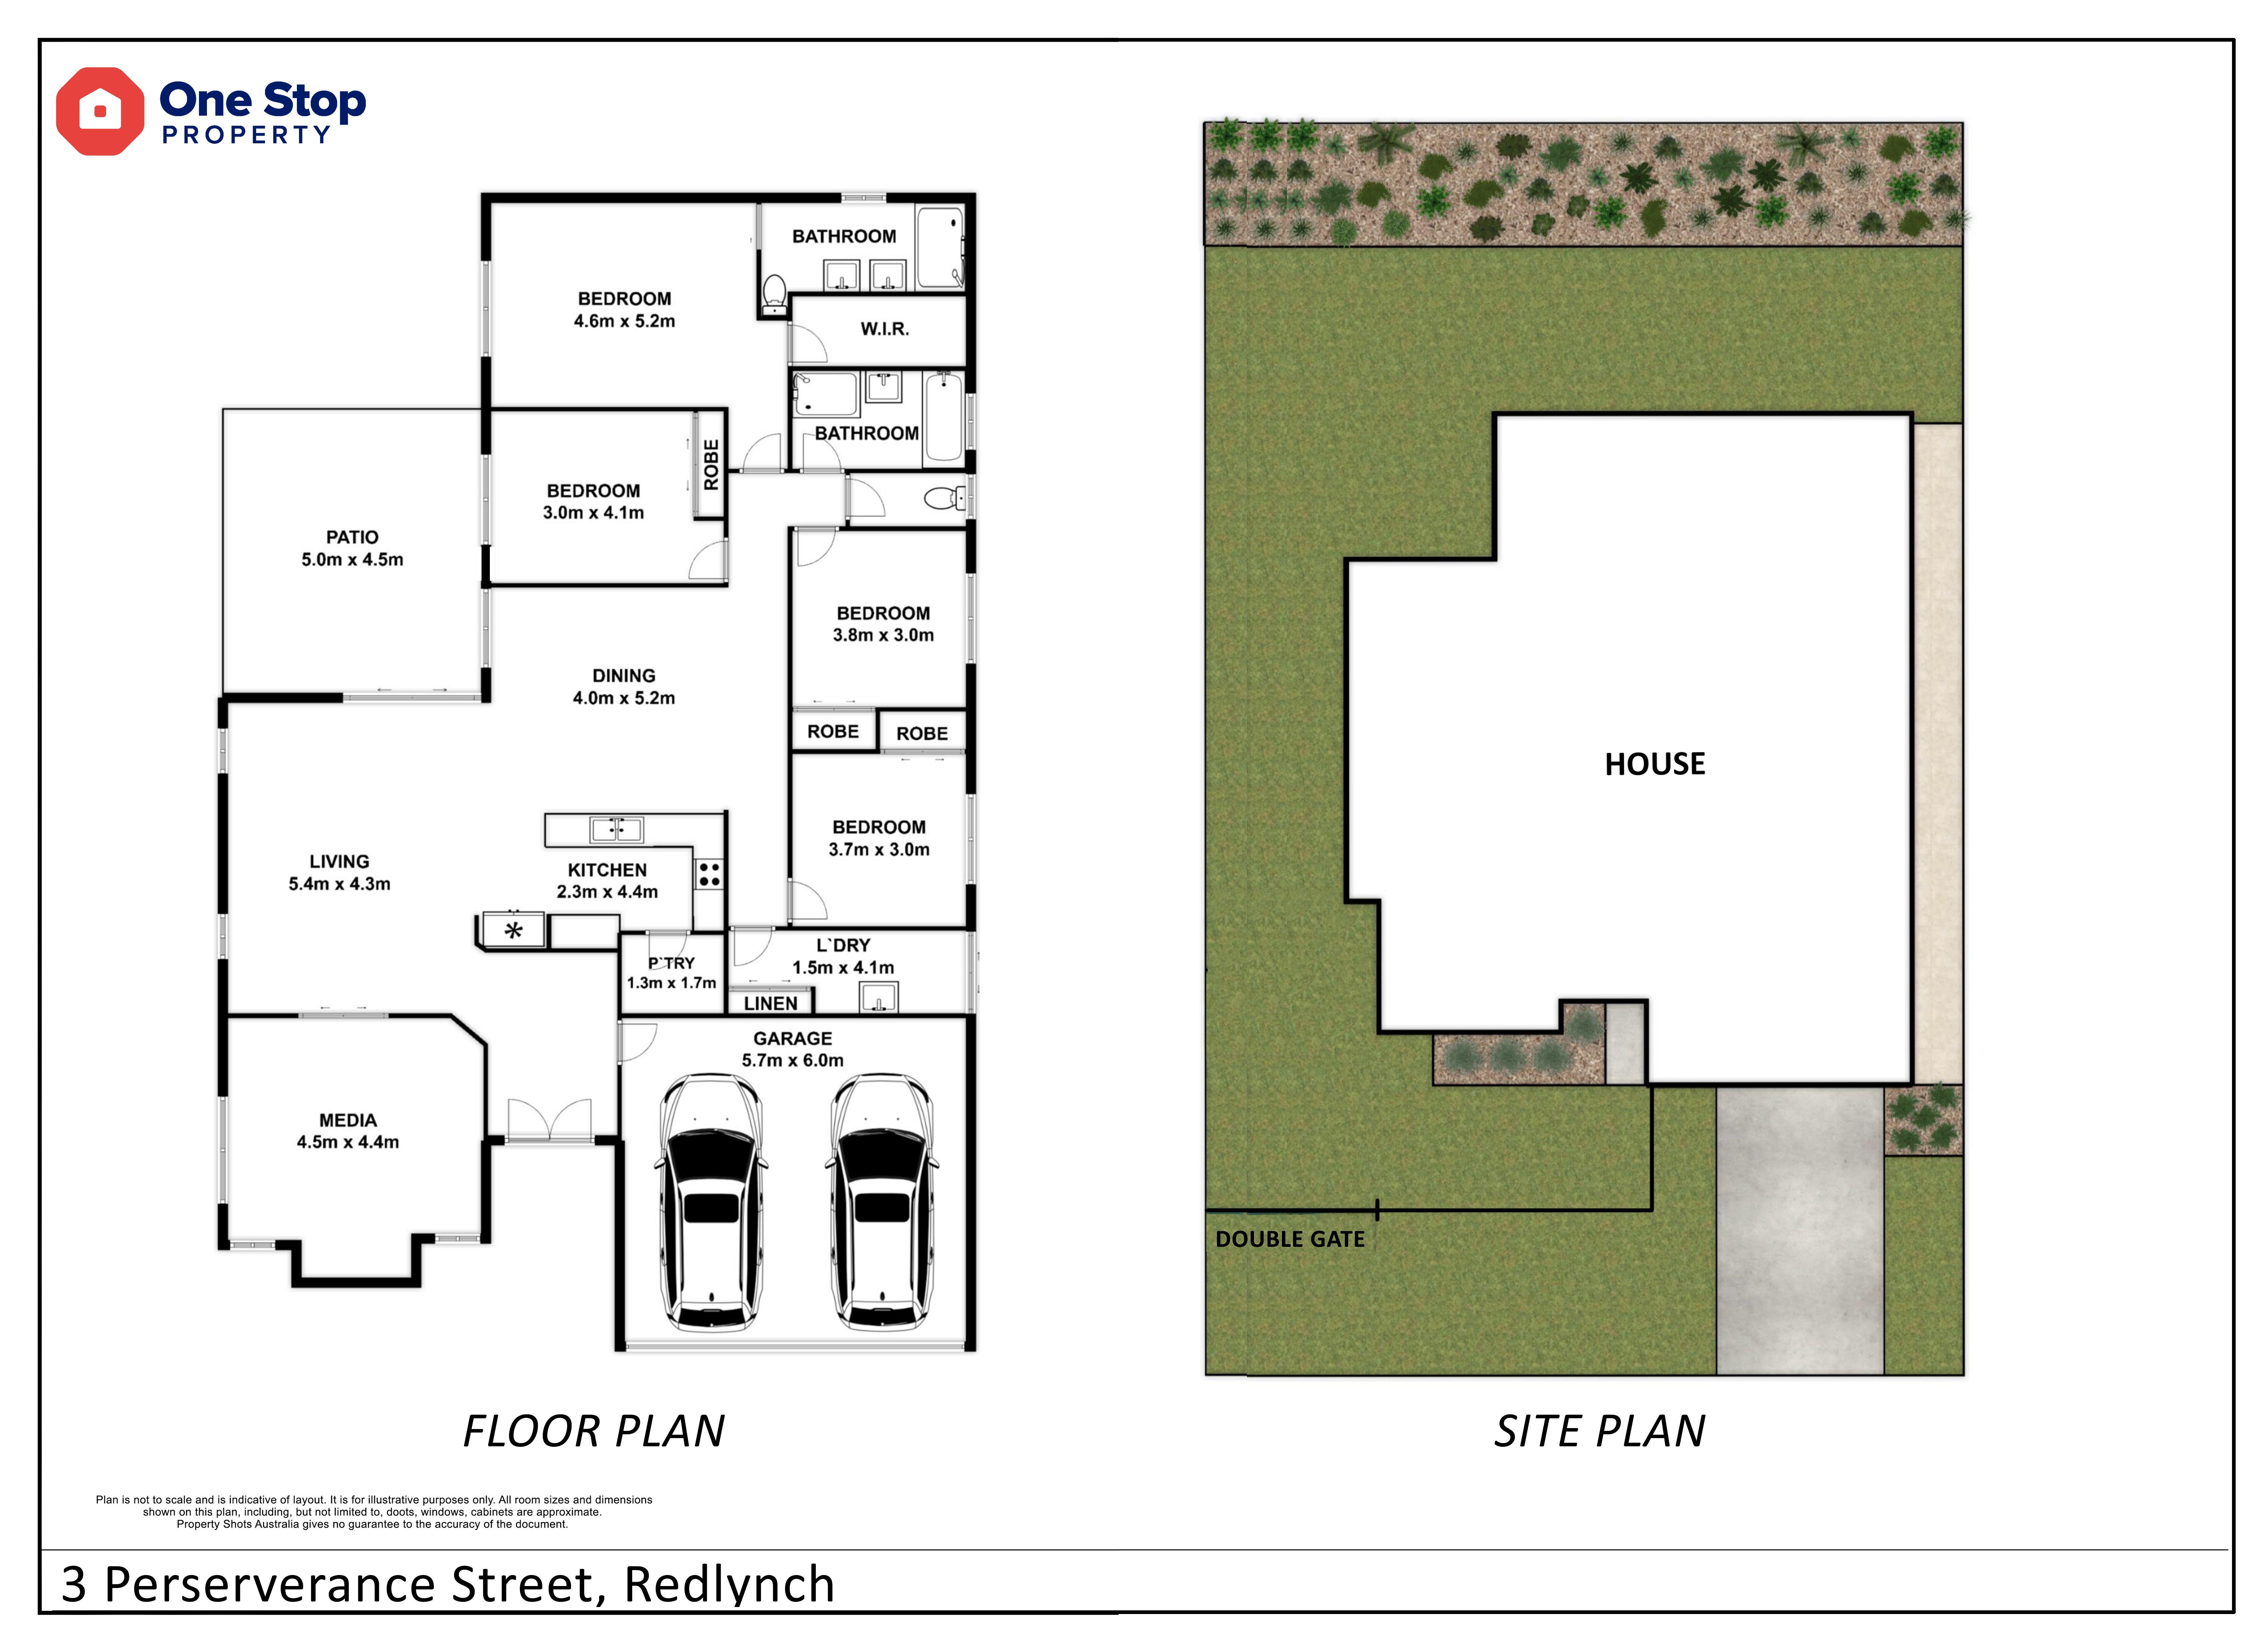 3 Perserverance, Redlynch QLD 4870